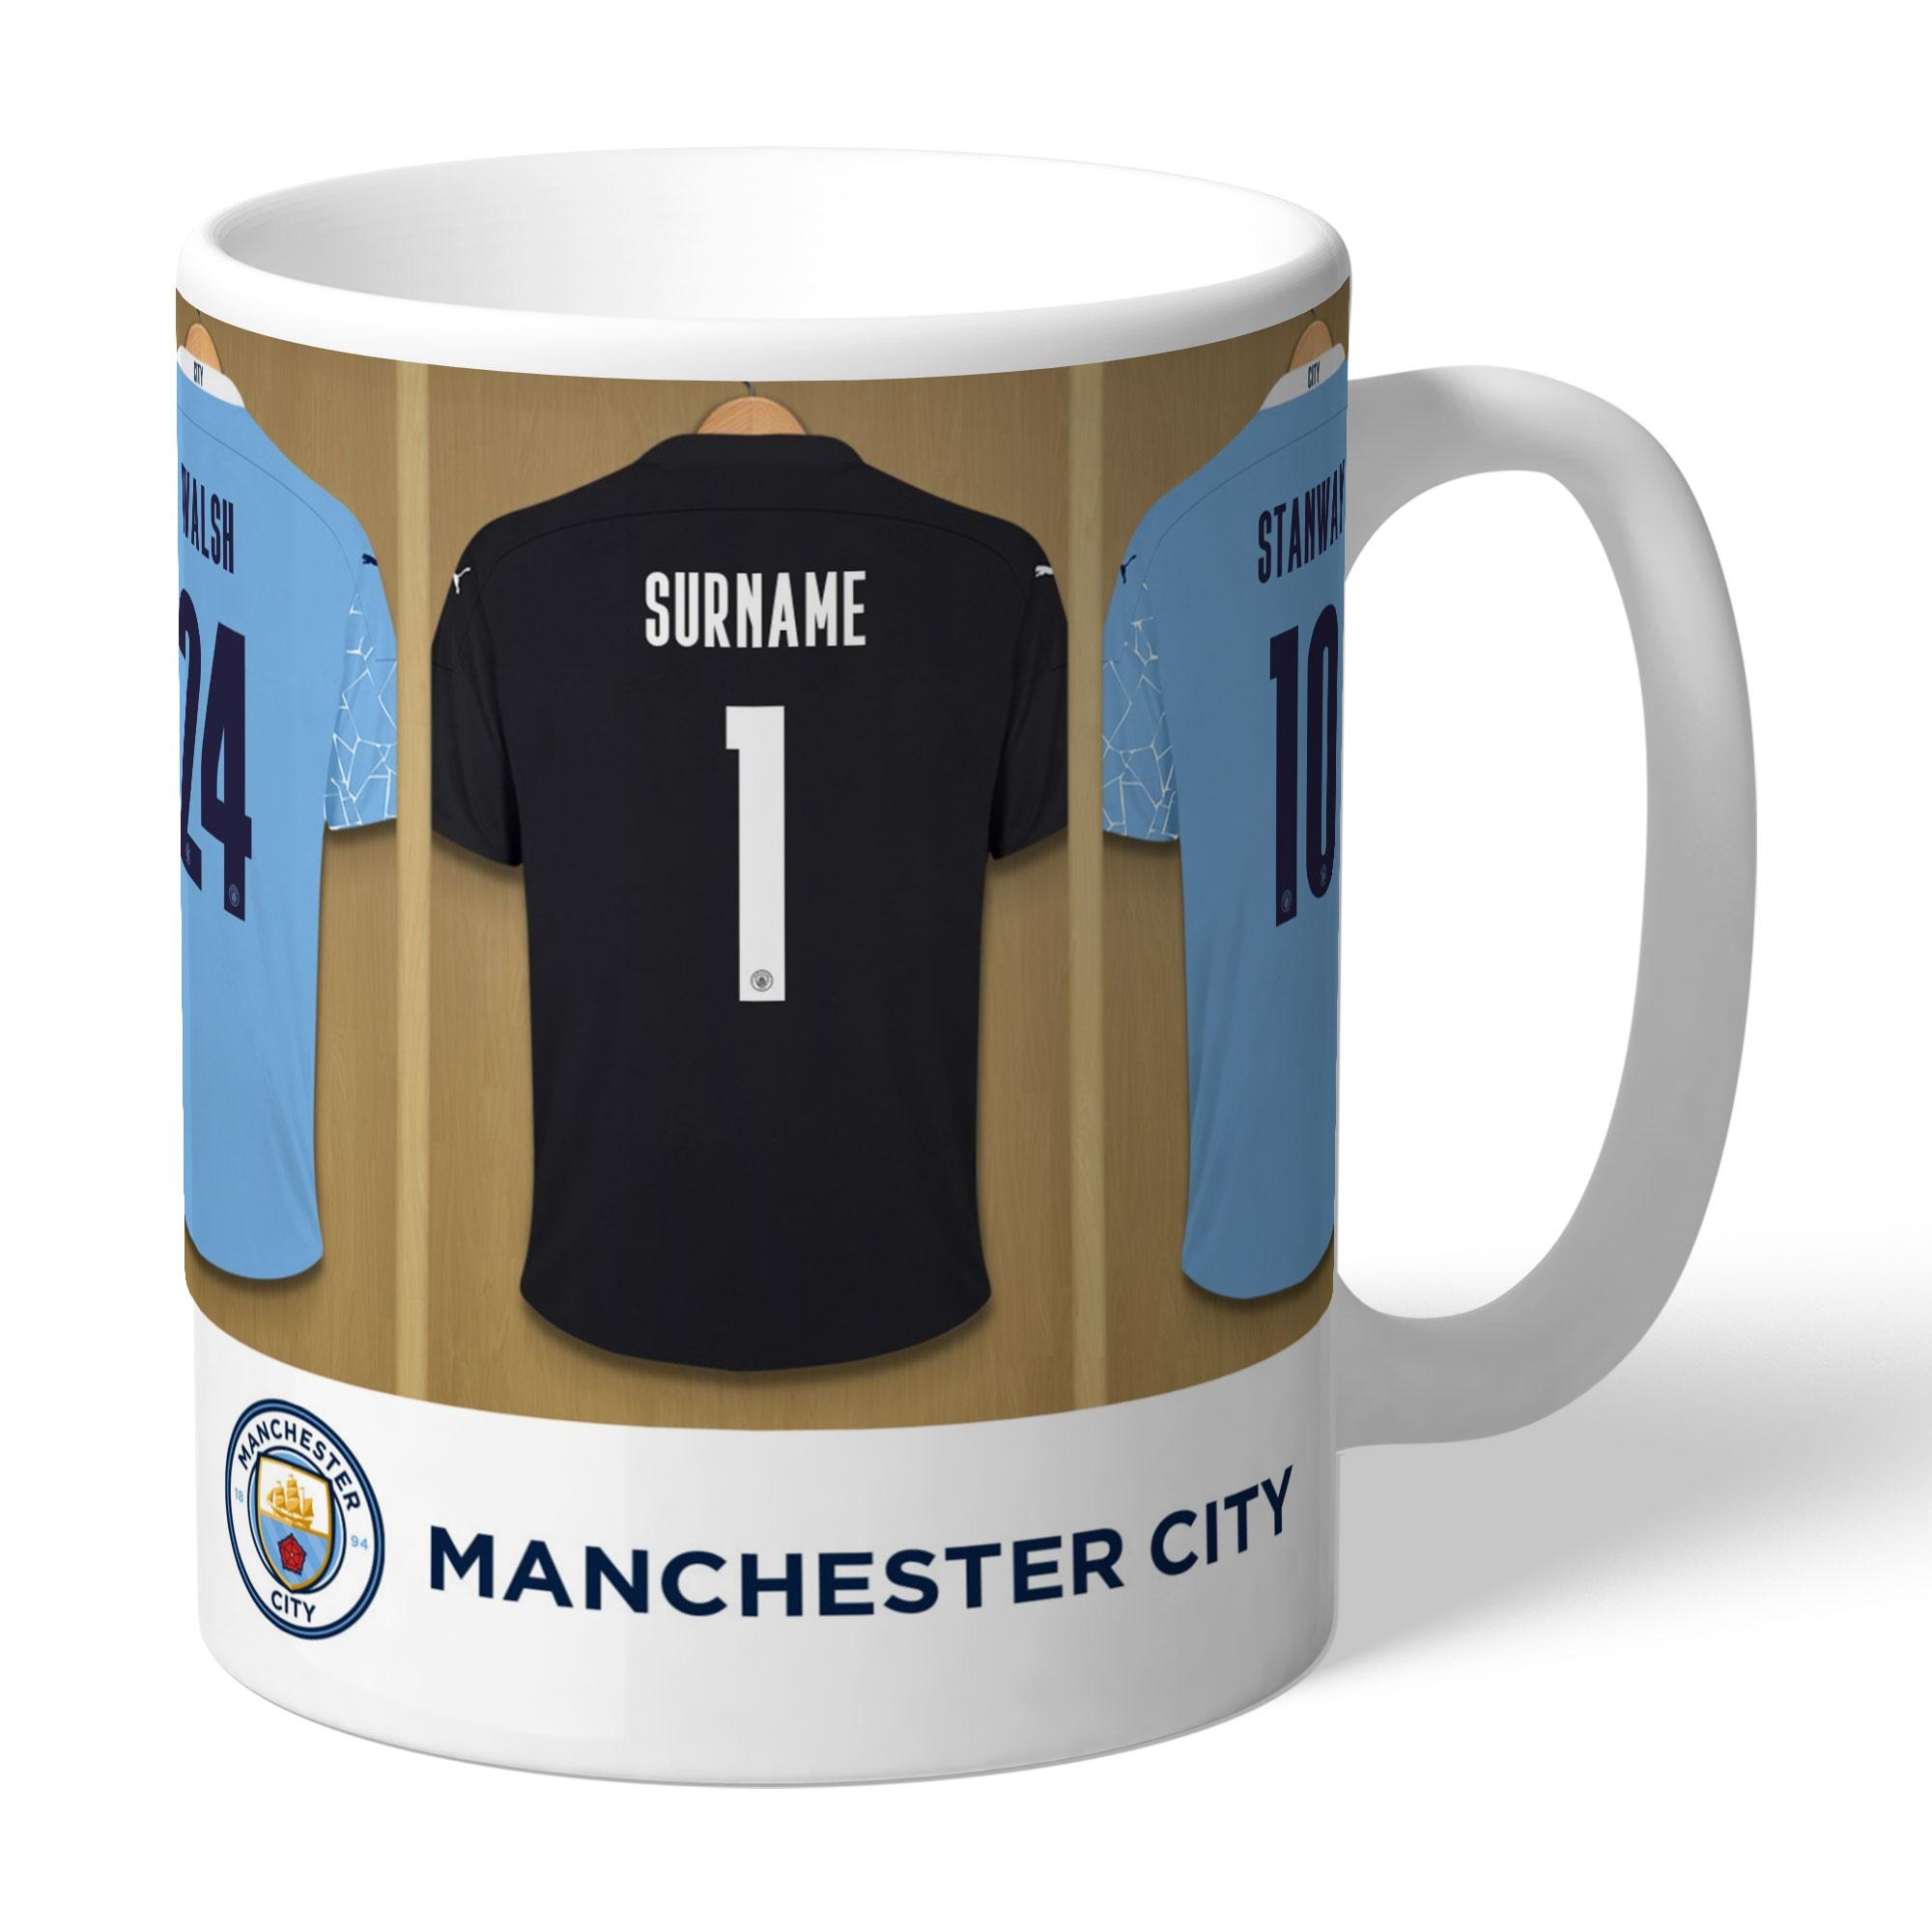 Manchester City FC Women's Team Goalkeeper Dressing Room Mug